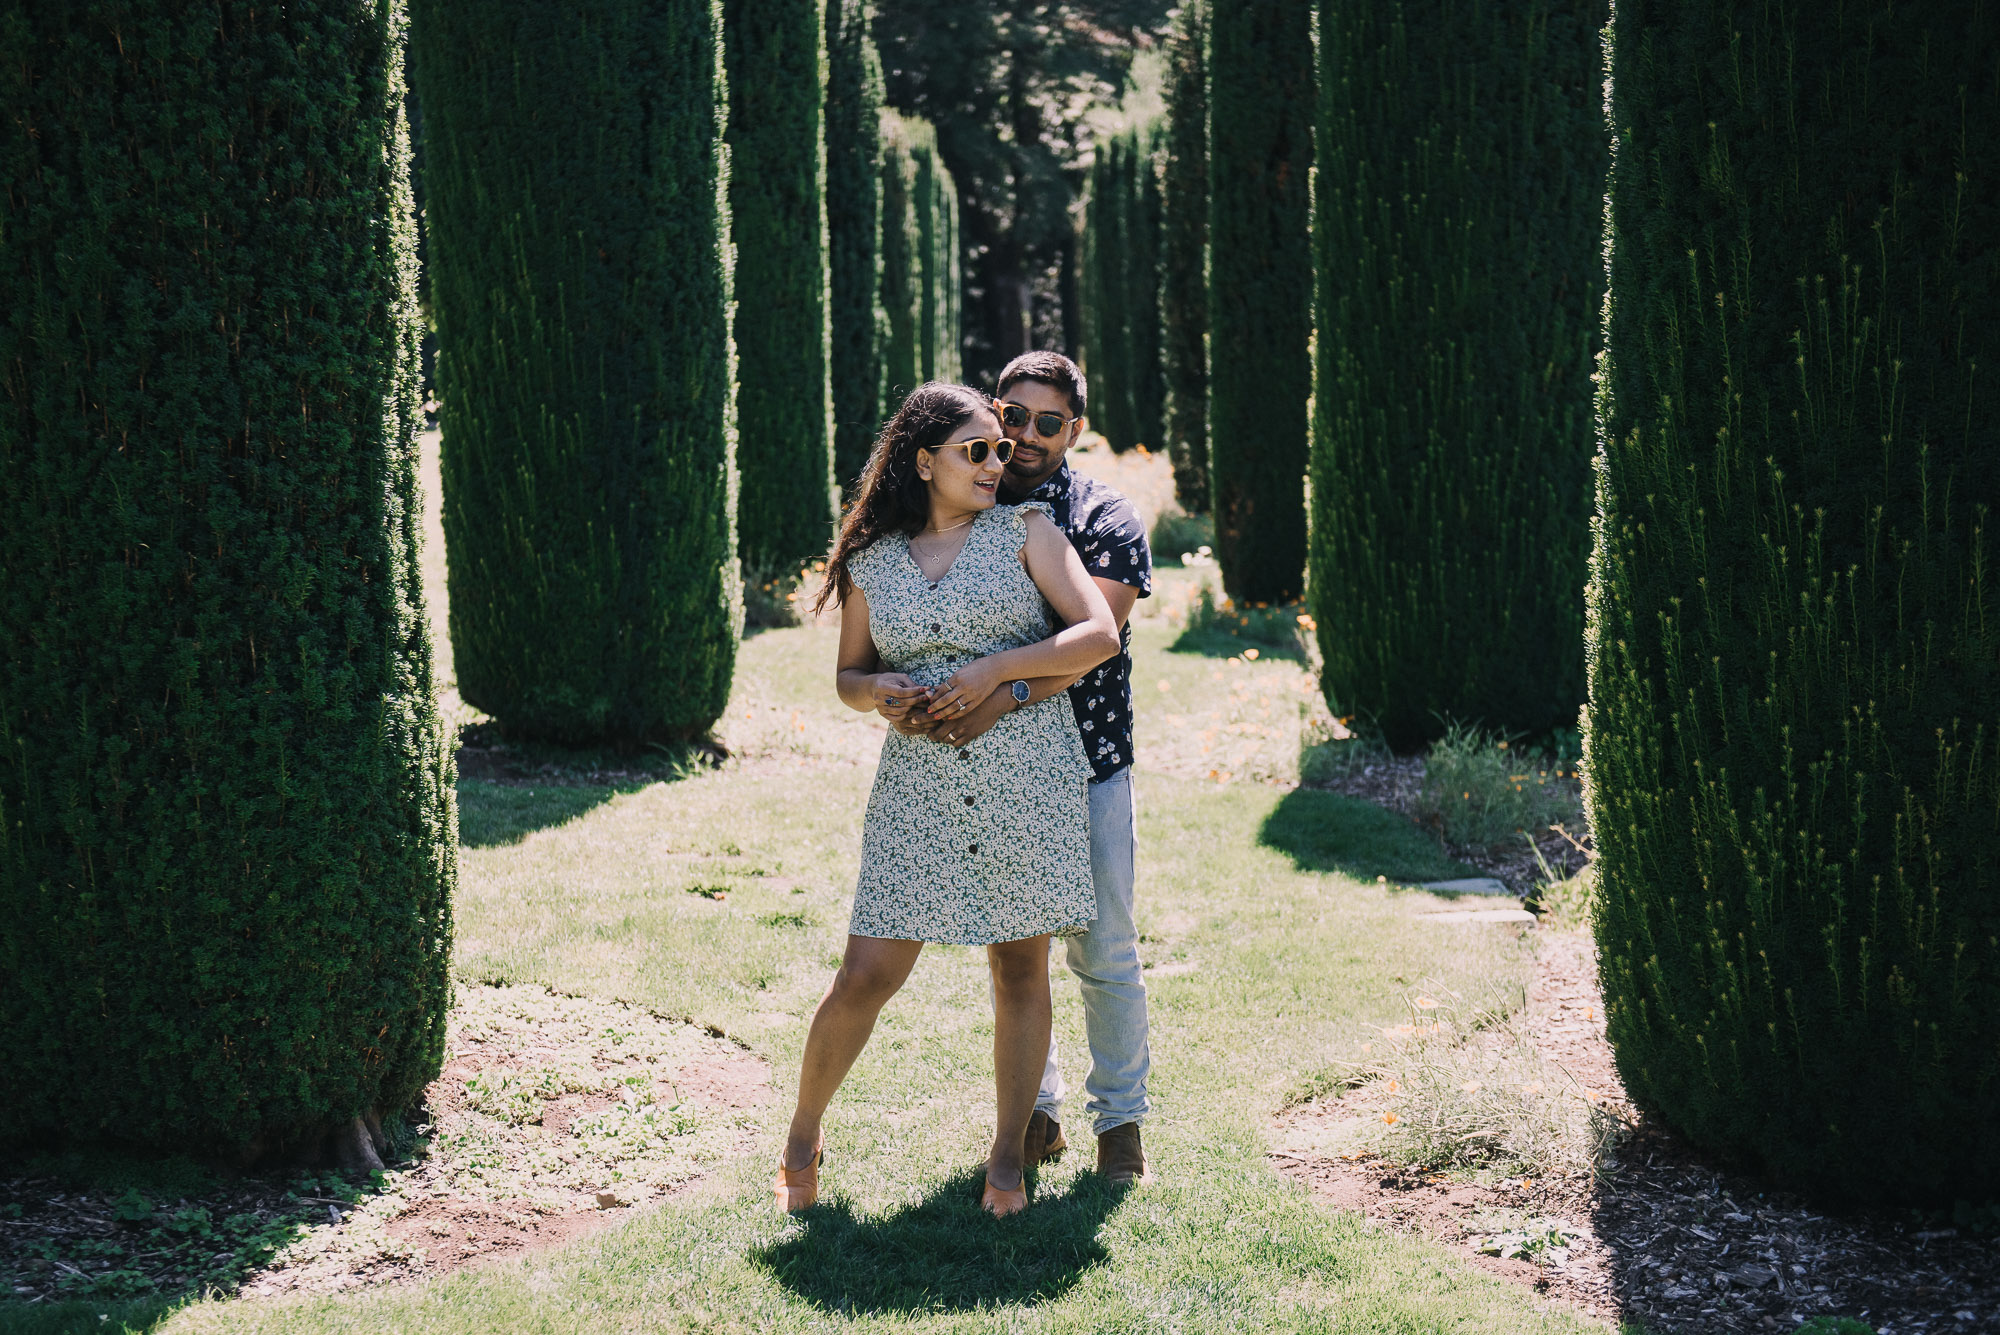 Fivoli Gardens Engagement Photos